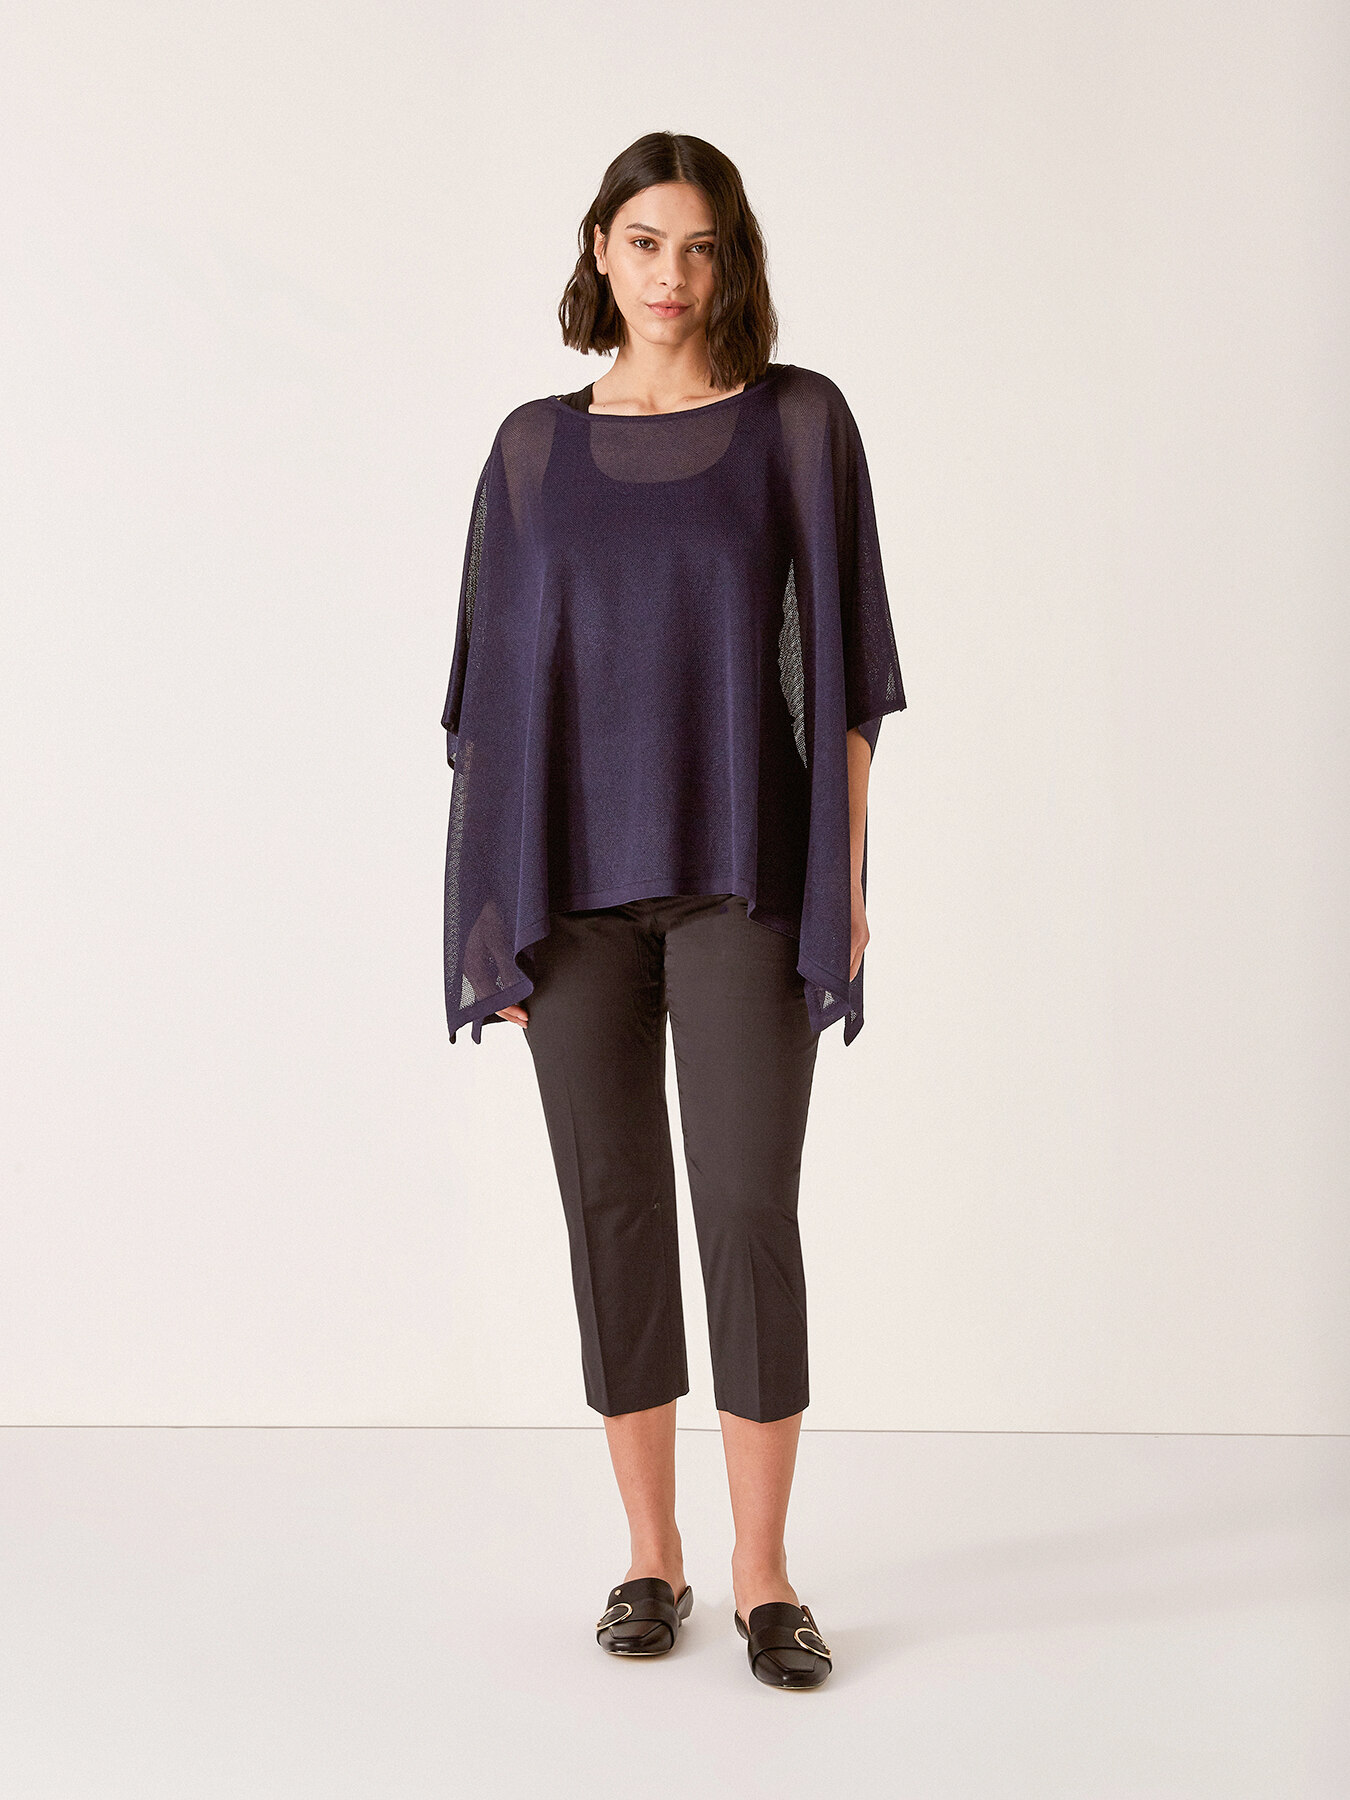 ELENA MIRO' | Trousers Conformed | P110Y11510K4